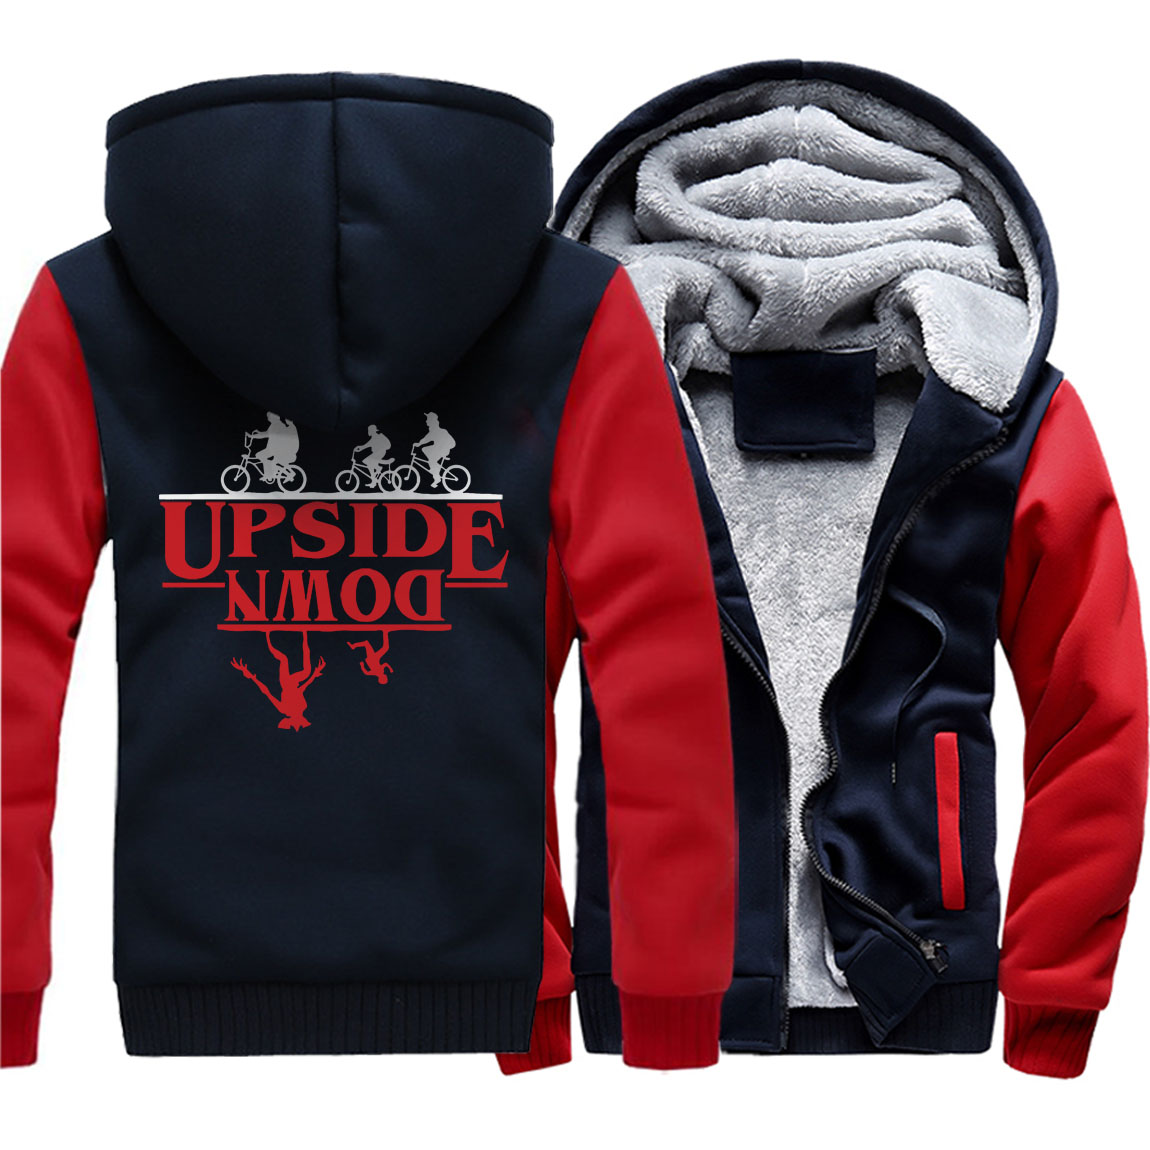 High Quality Streetwear Jacket Coats 2019 Stranger Things Hoodies Winter Wool Liner Clothes Men